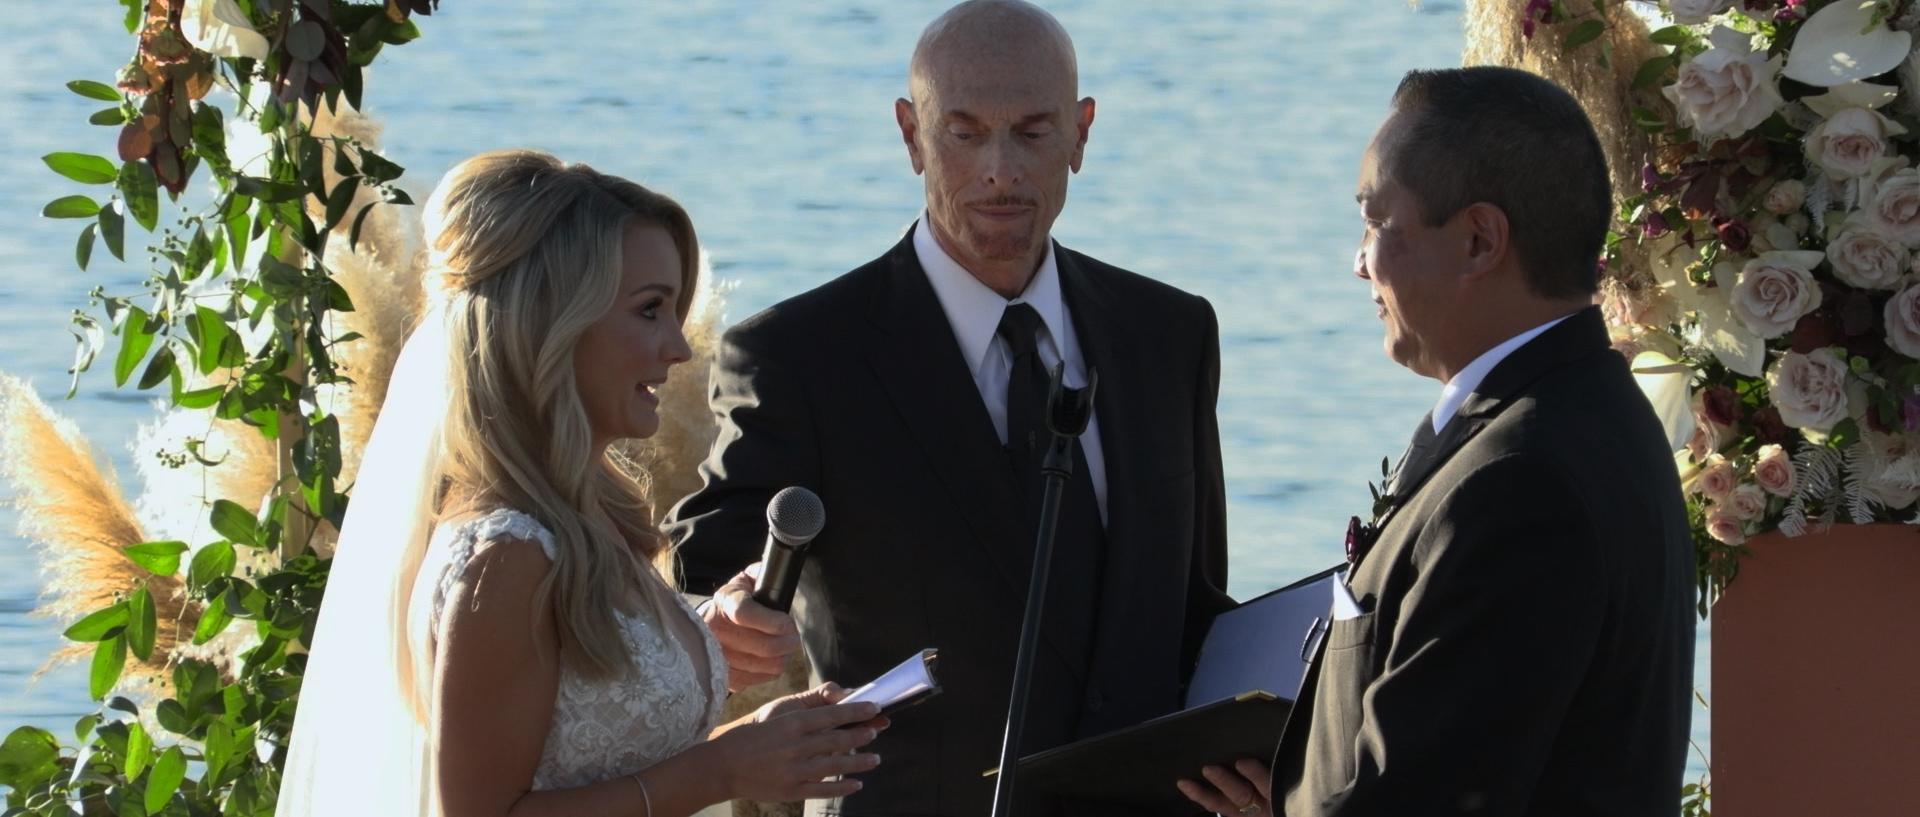 Jessica and Jeffrey Wedding Story.06_36_45_22.Still019.jpg